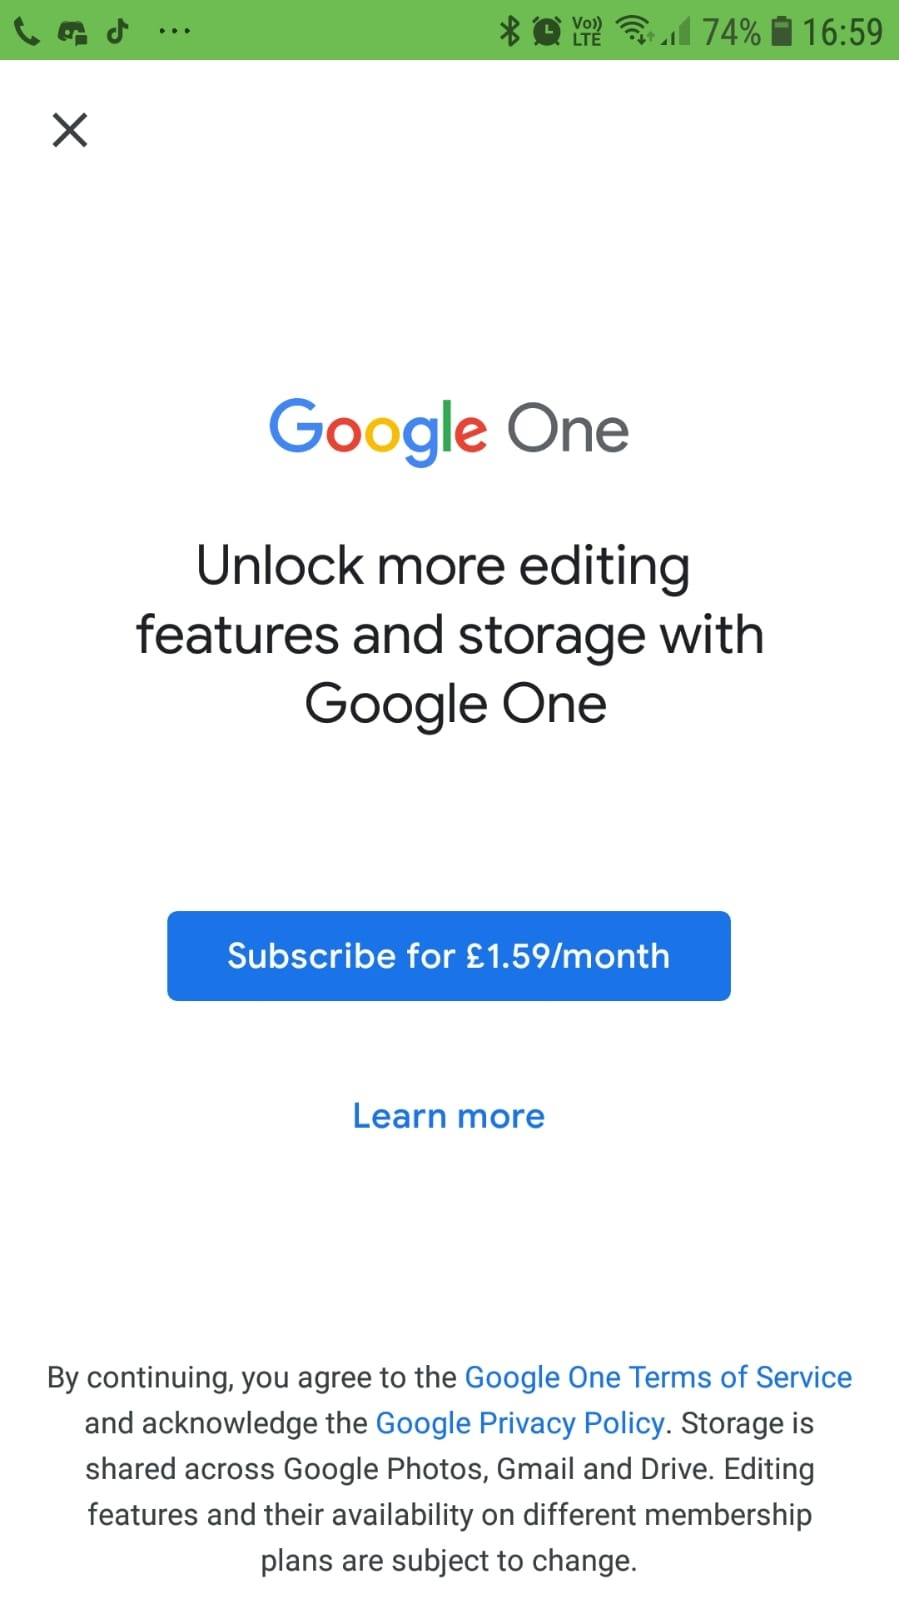 Google Photos The benefits of Google One